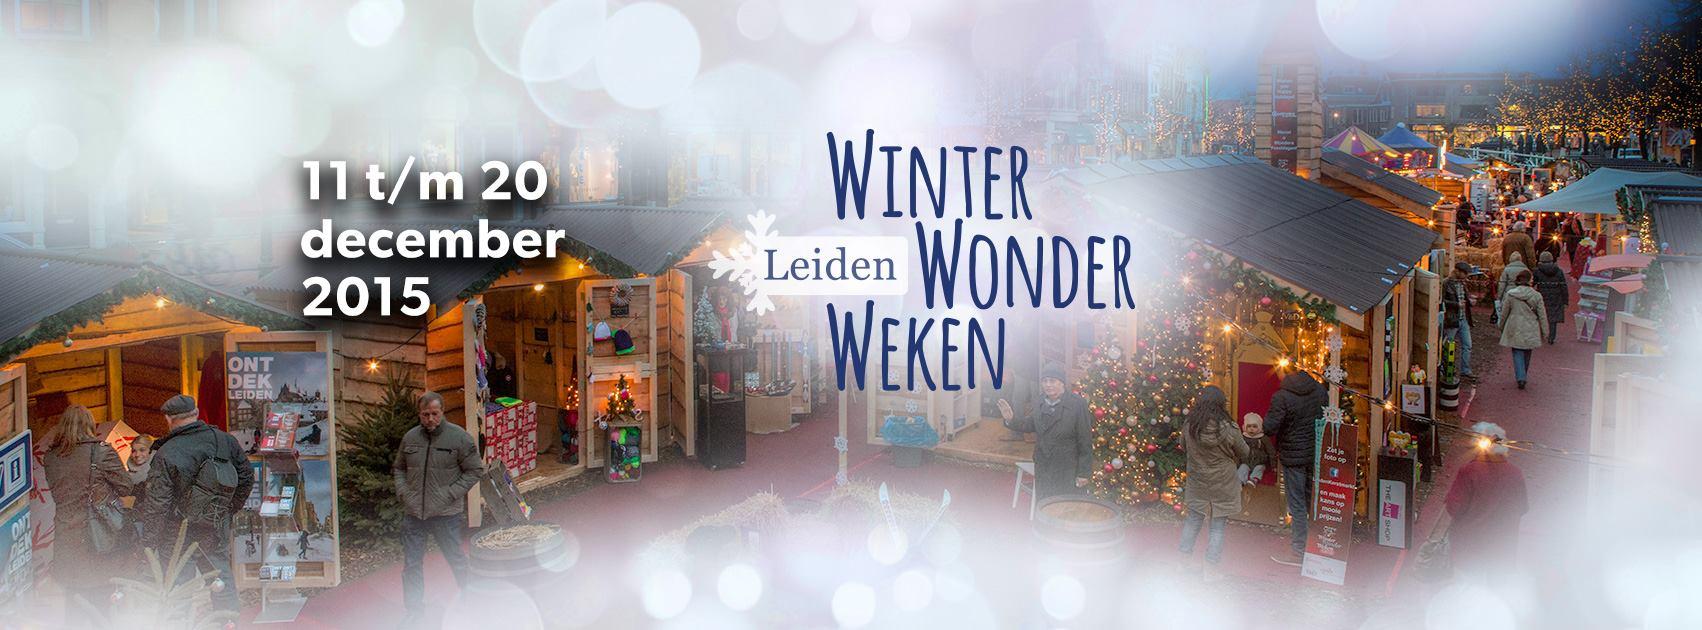 WinterWonderweken2015